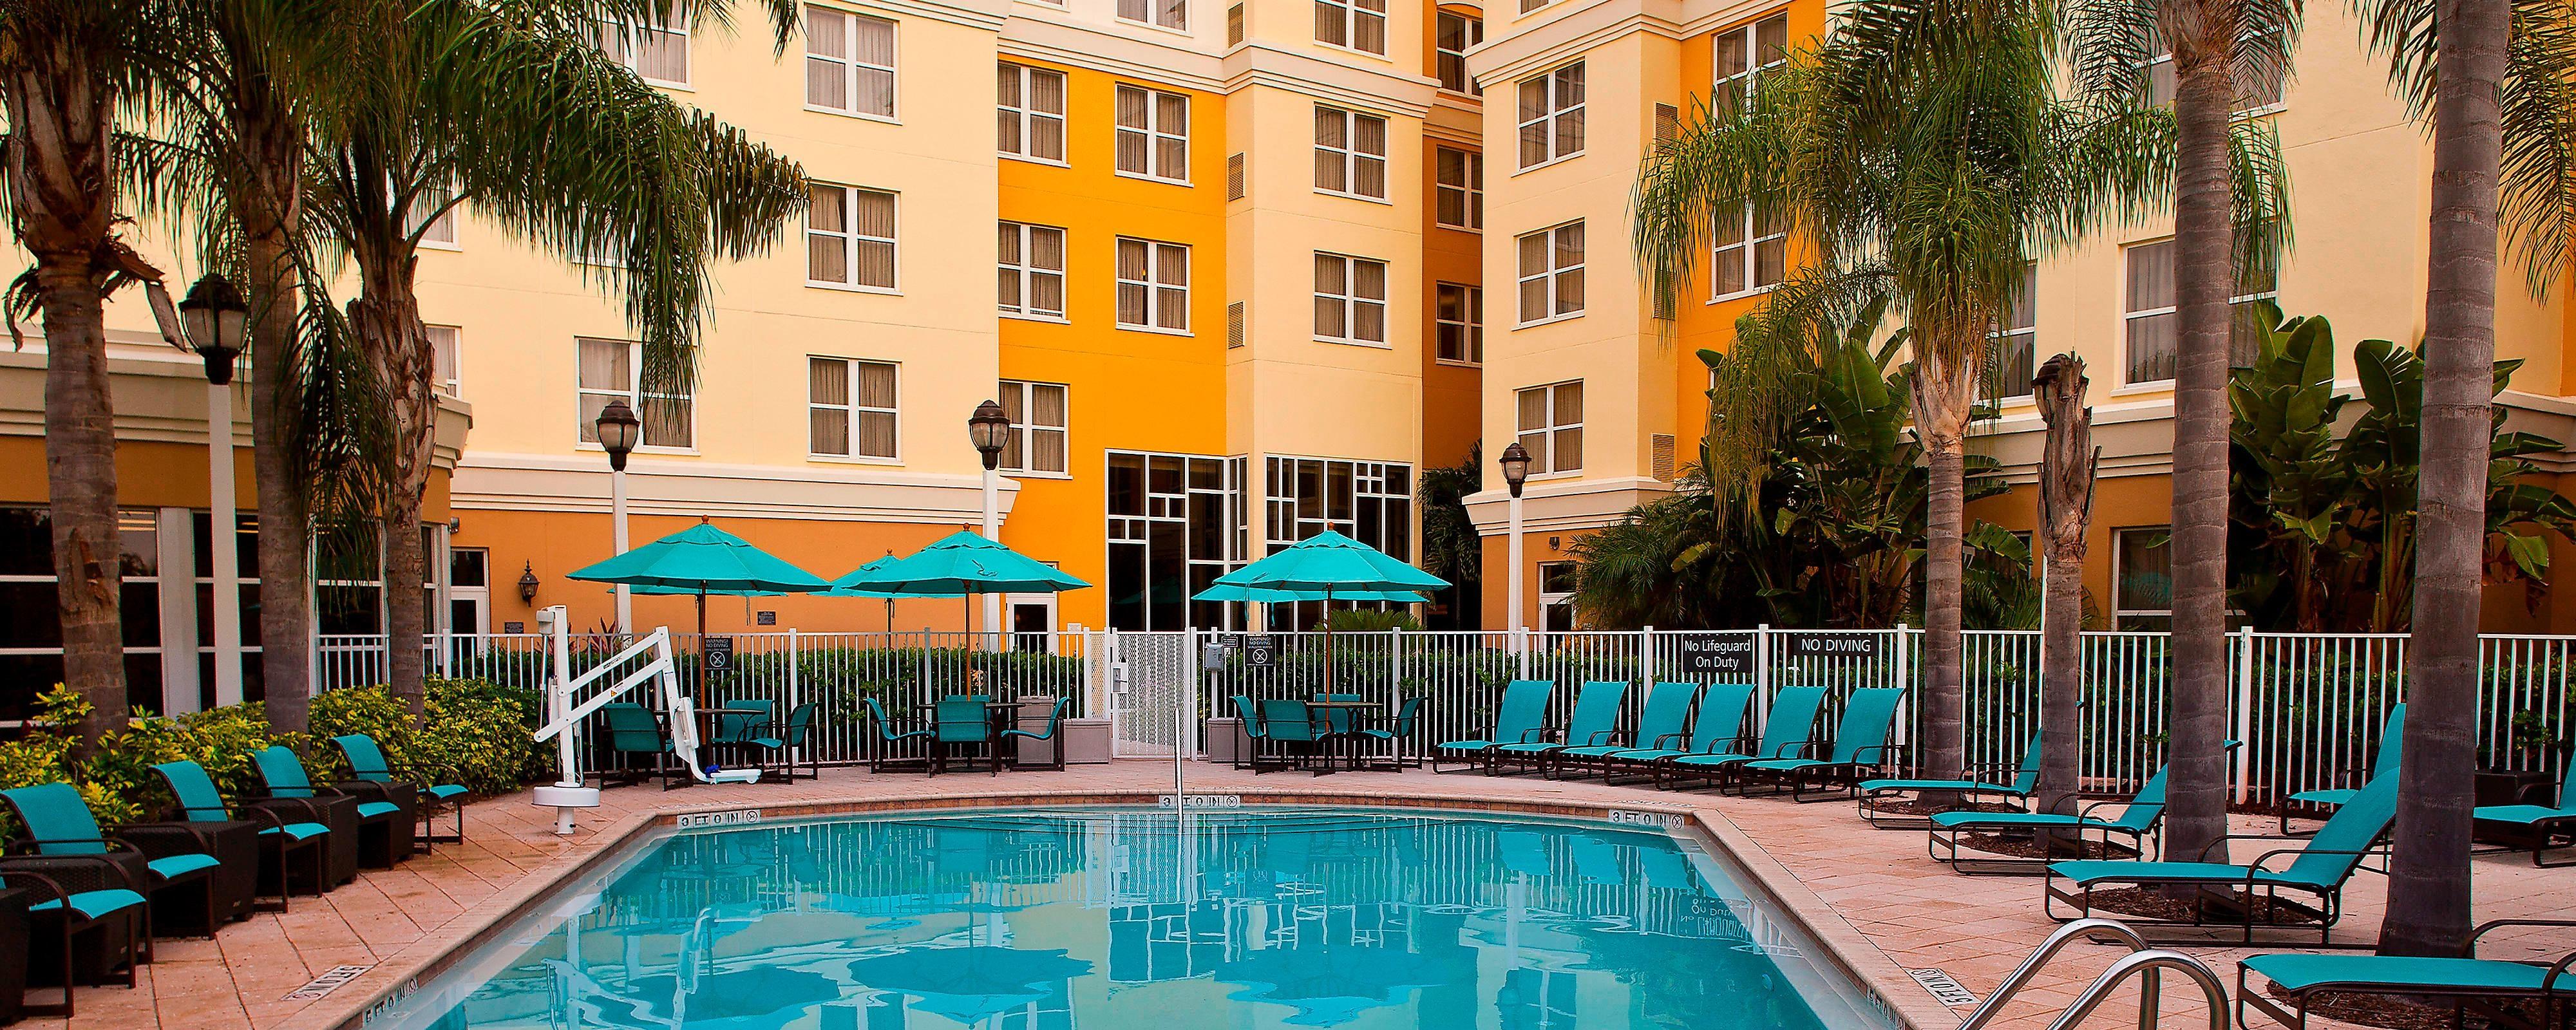 Daytona Beach Speedway Hotel Pool